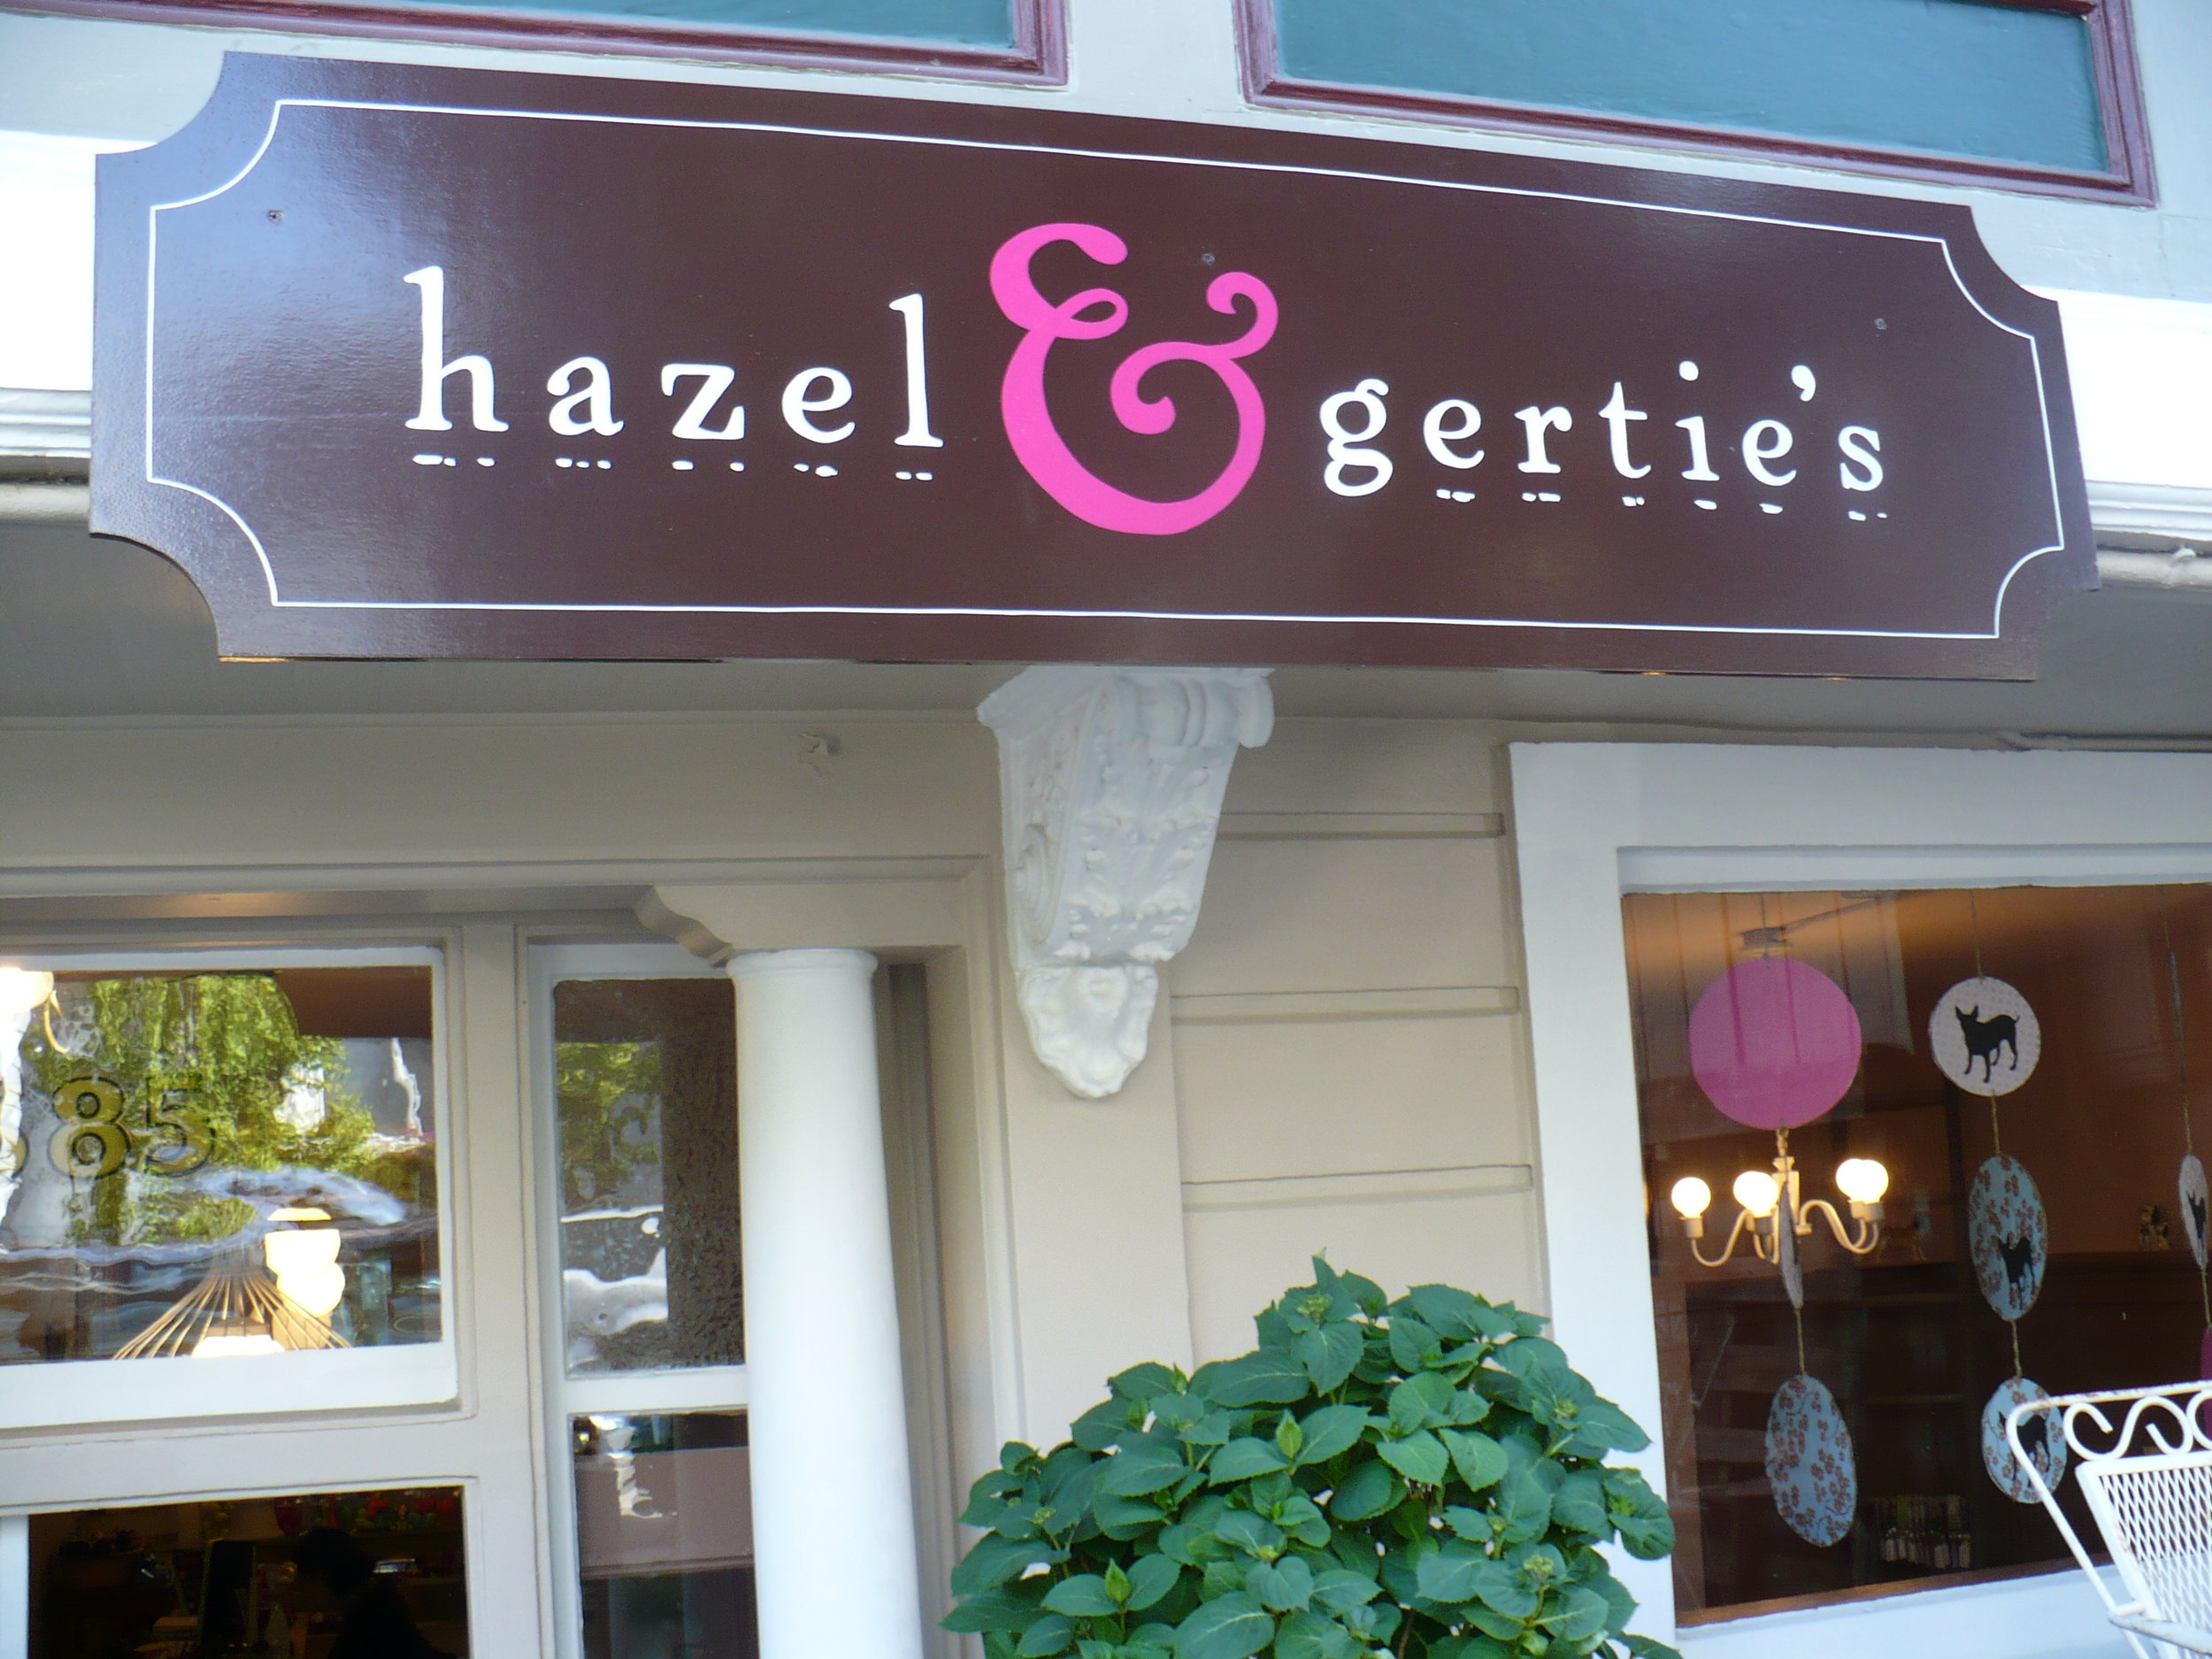 HAND-hazel--gerties_3131053349_o.jpg